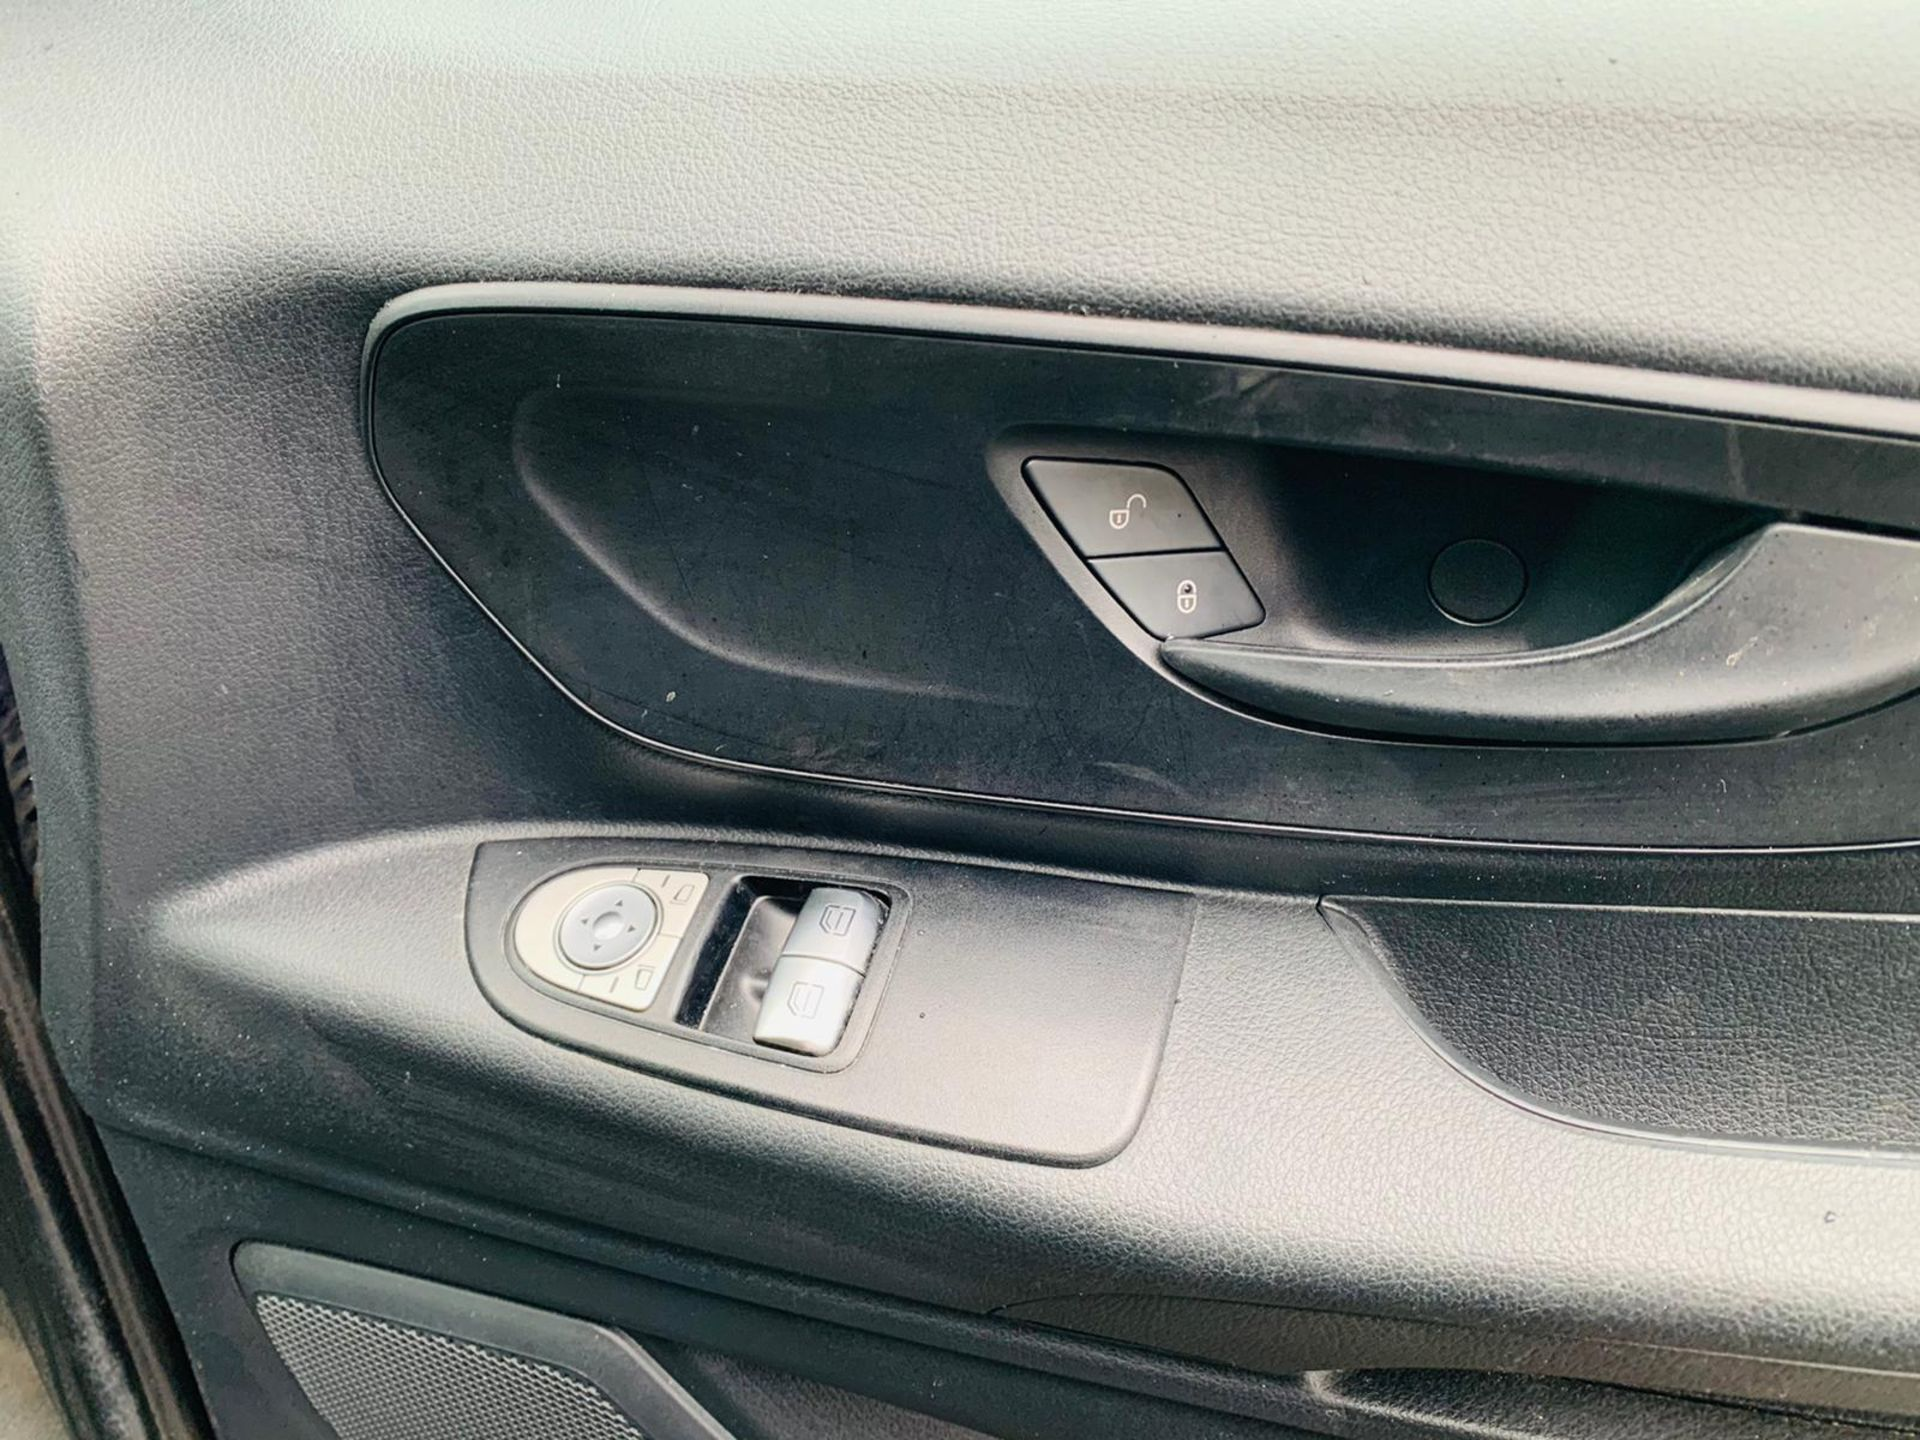 (RESERVE MET) Mercedes Vito 116Cdi Sporty Spec (161 BHP) Bluetech 6 Speed Van - 2016 Model - AC - Image 27 of 28